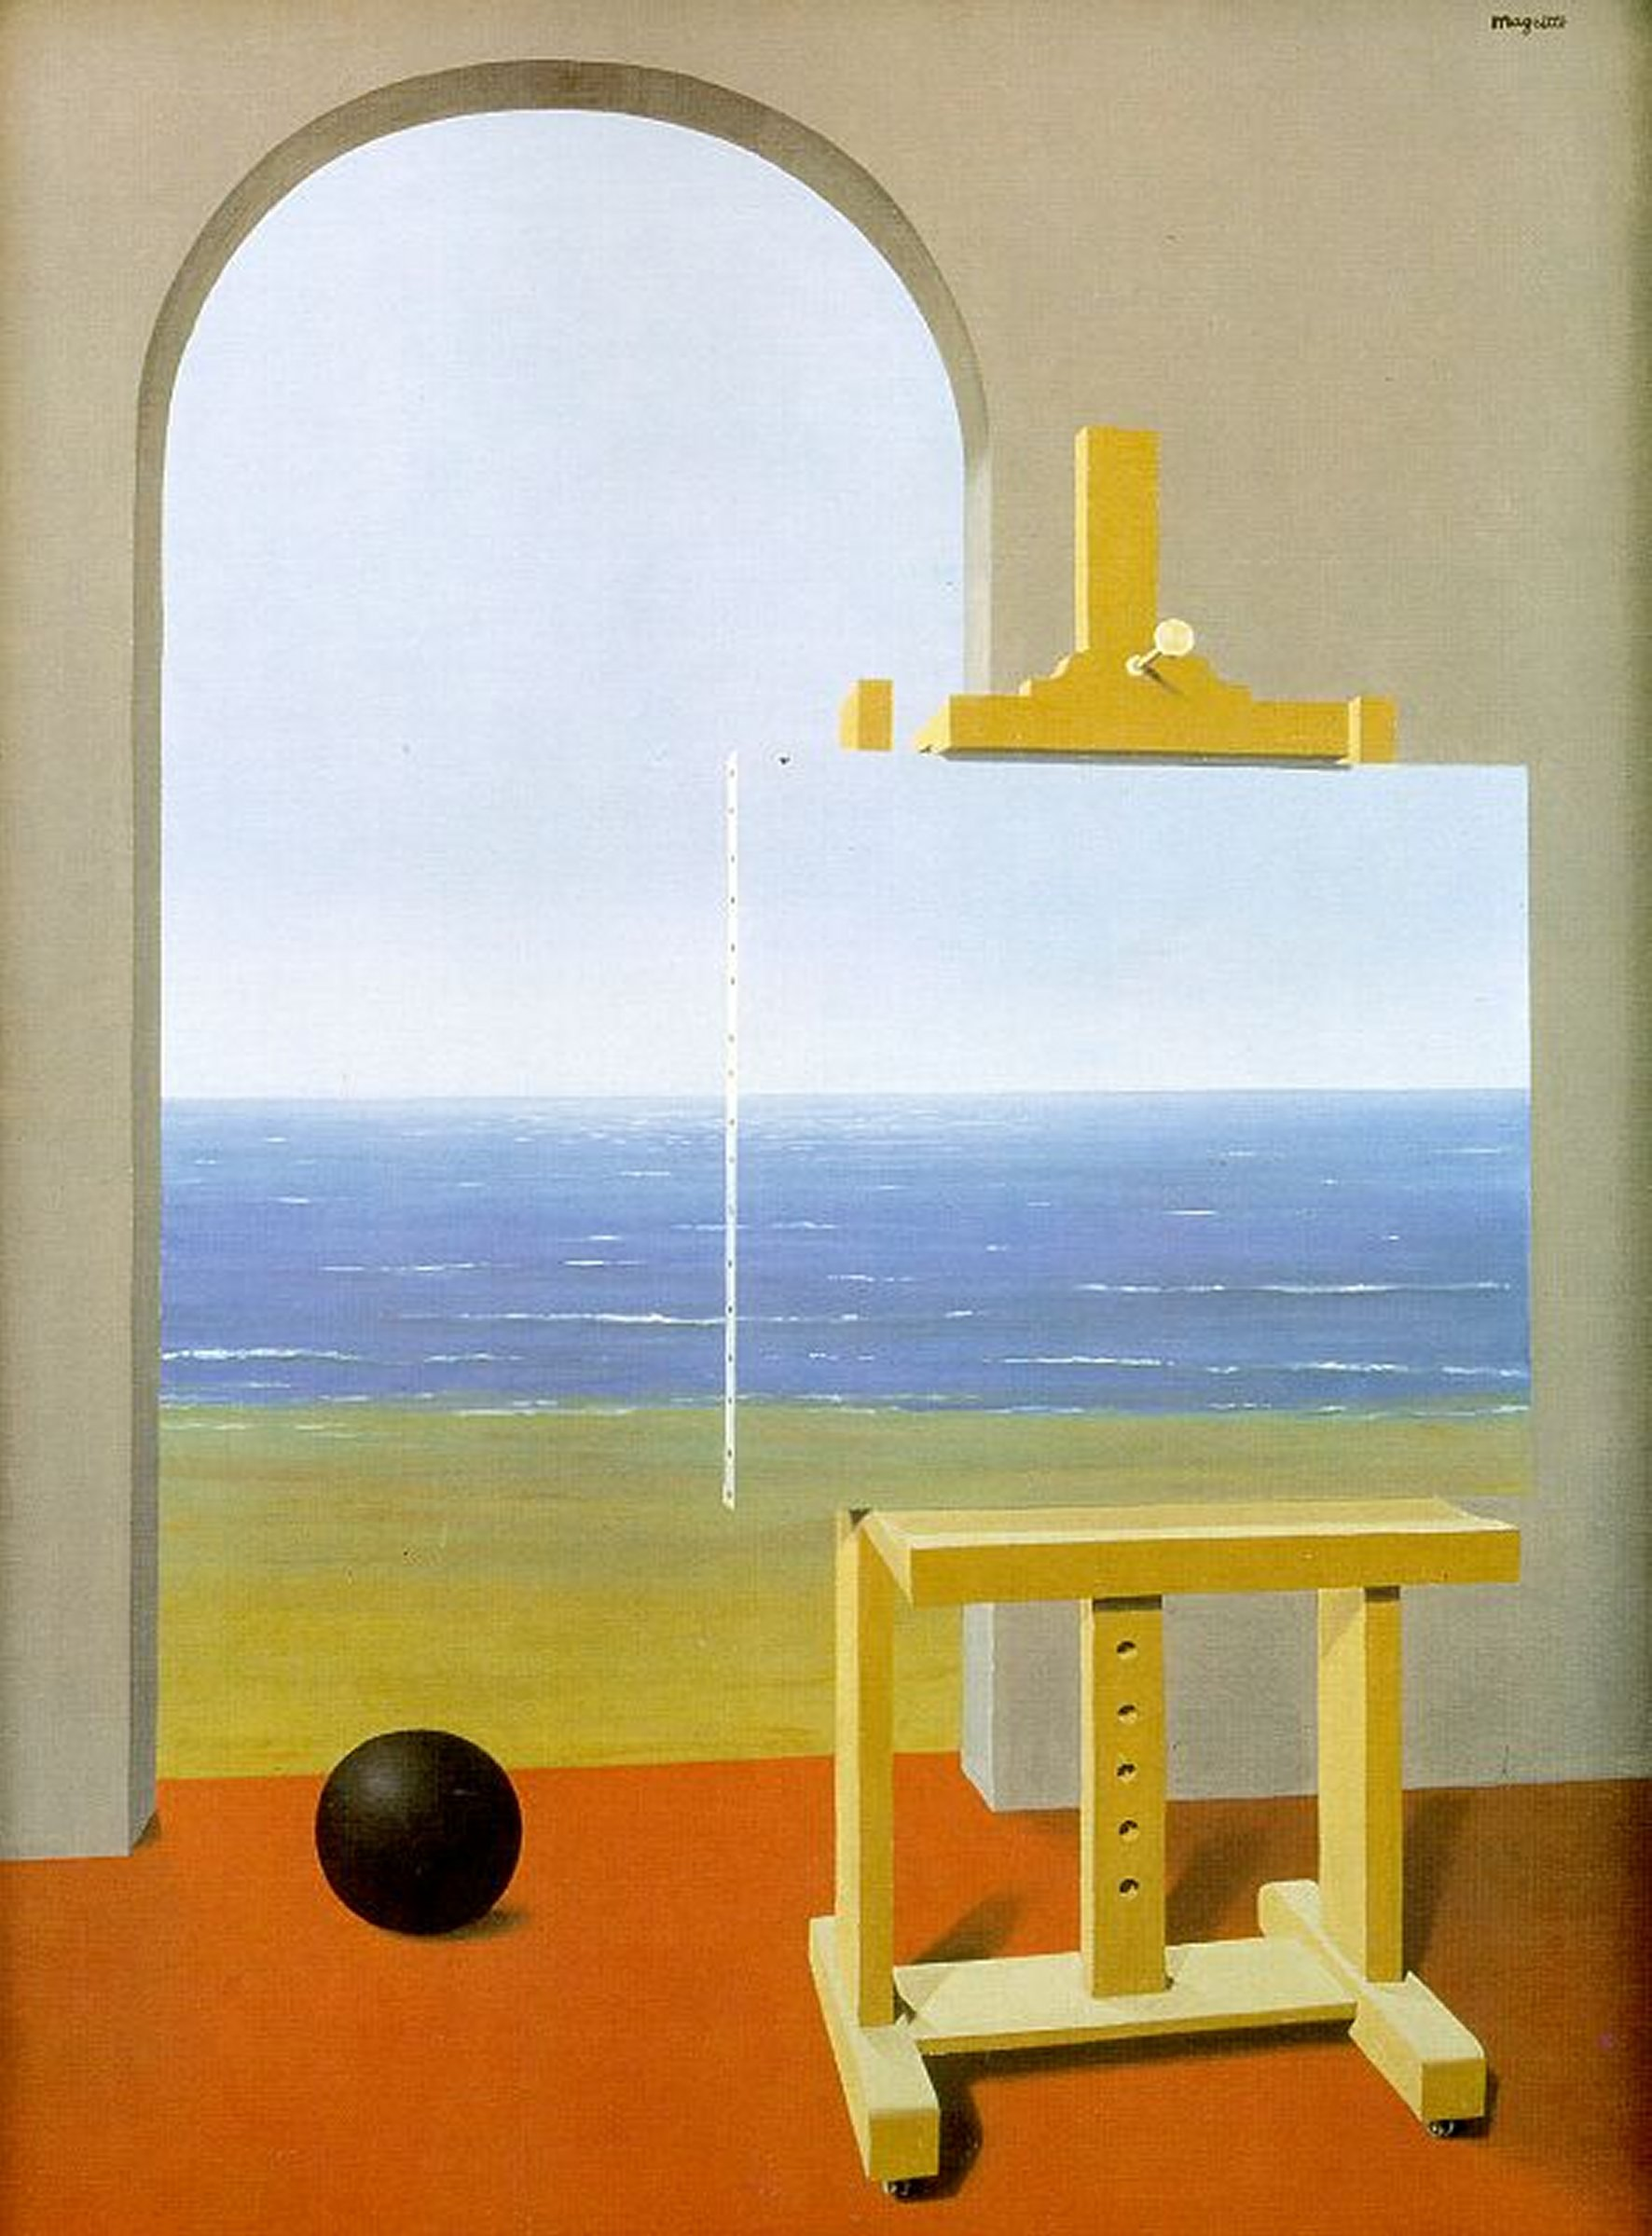 La_Condicion_Humana_Magritte